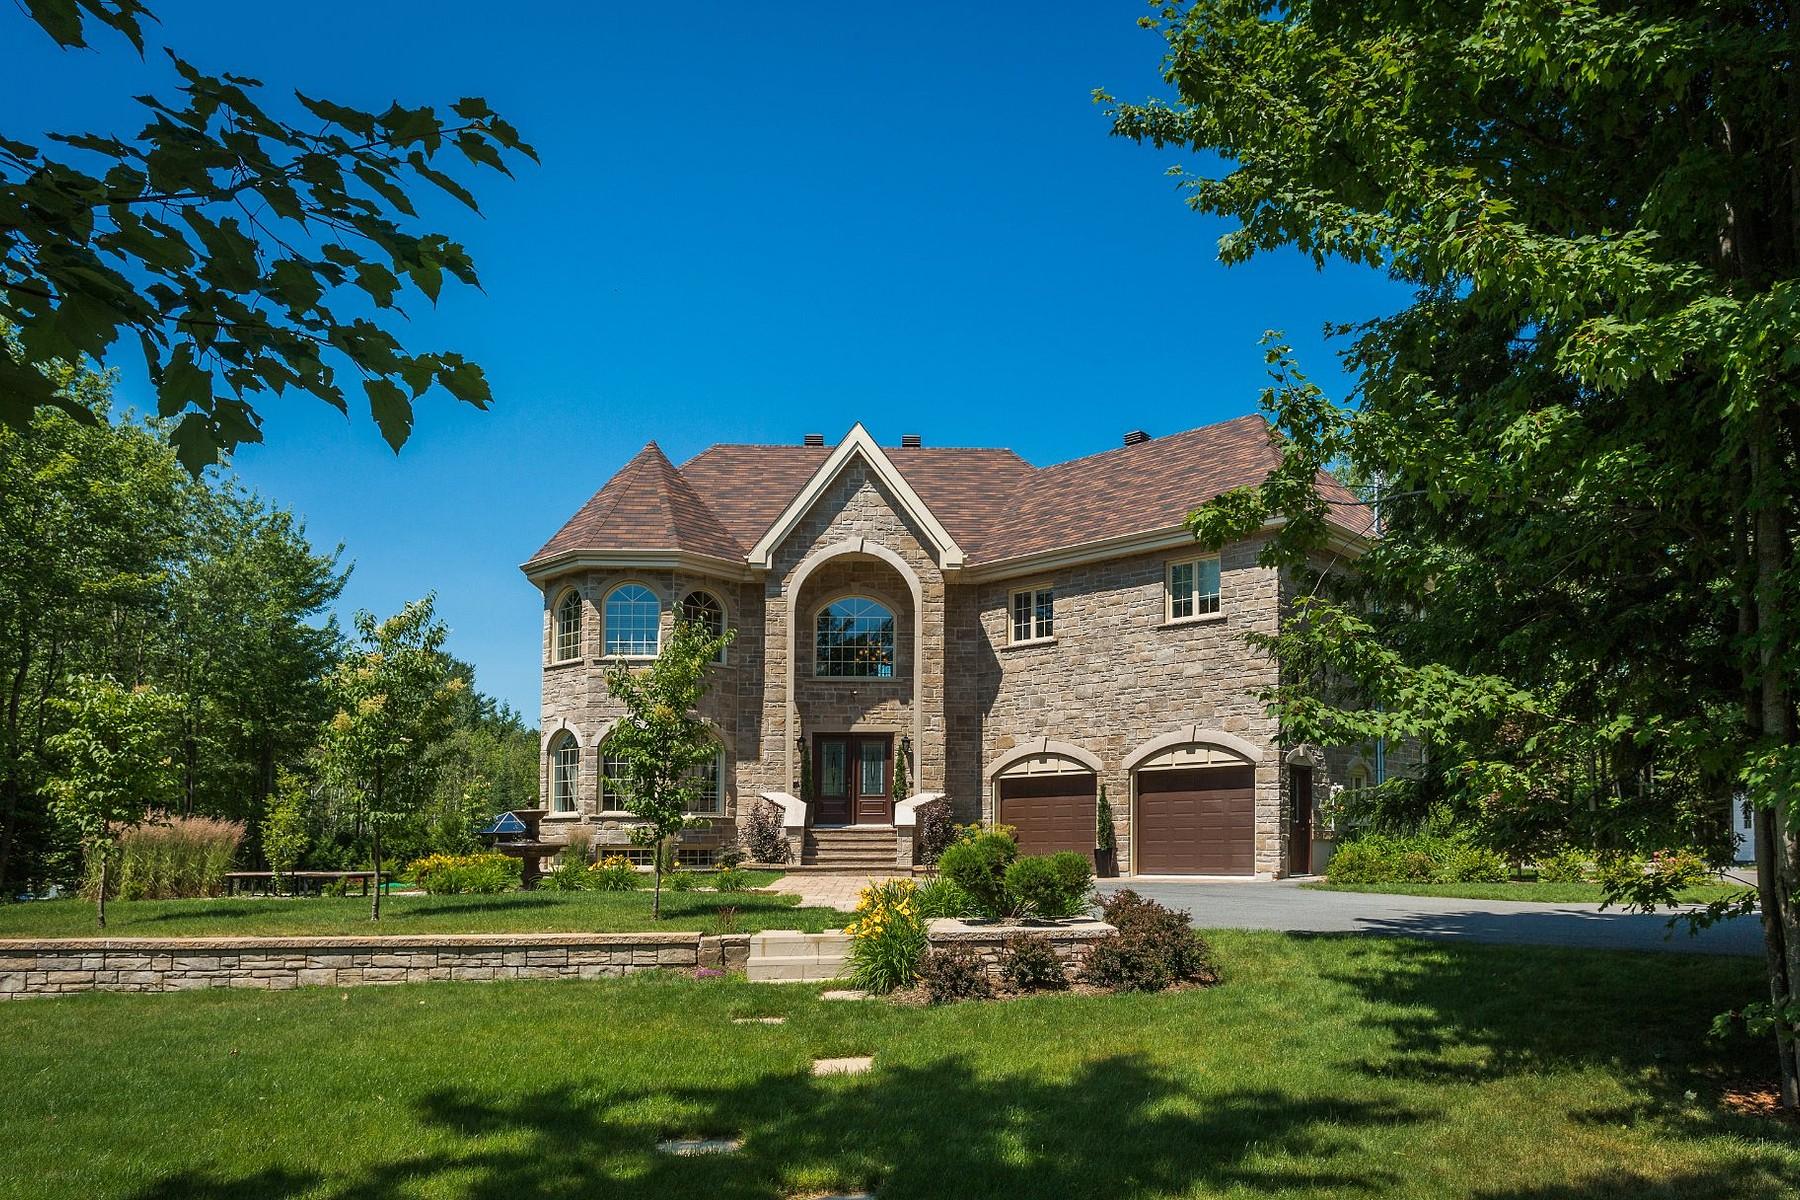 Single Family Home for Sale at Granby, Montérégie 152 Rue Meloche, Granby, Quebec, J2H0H1 Canada